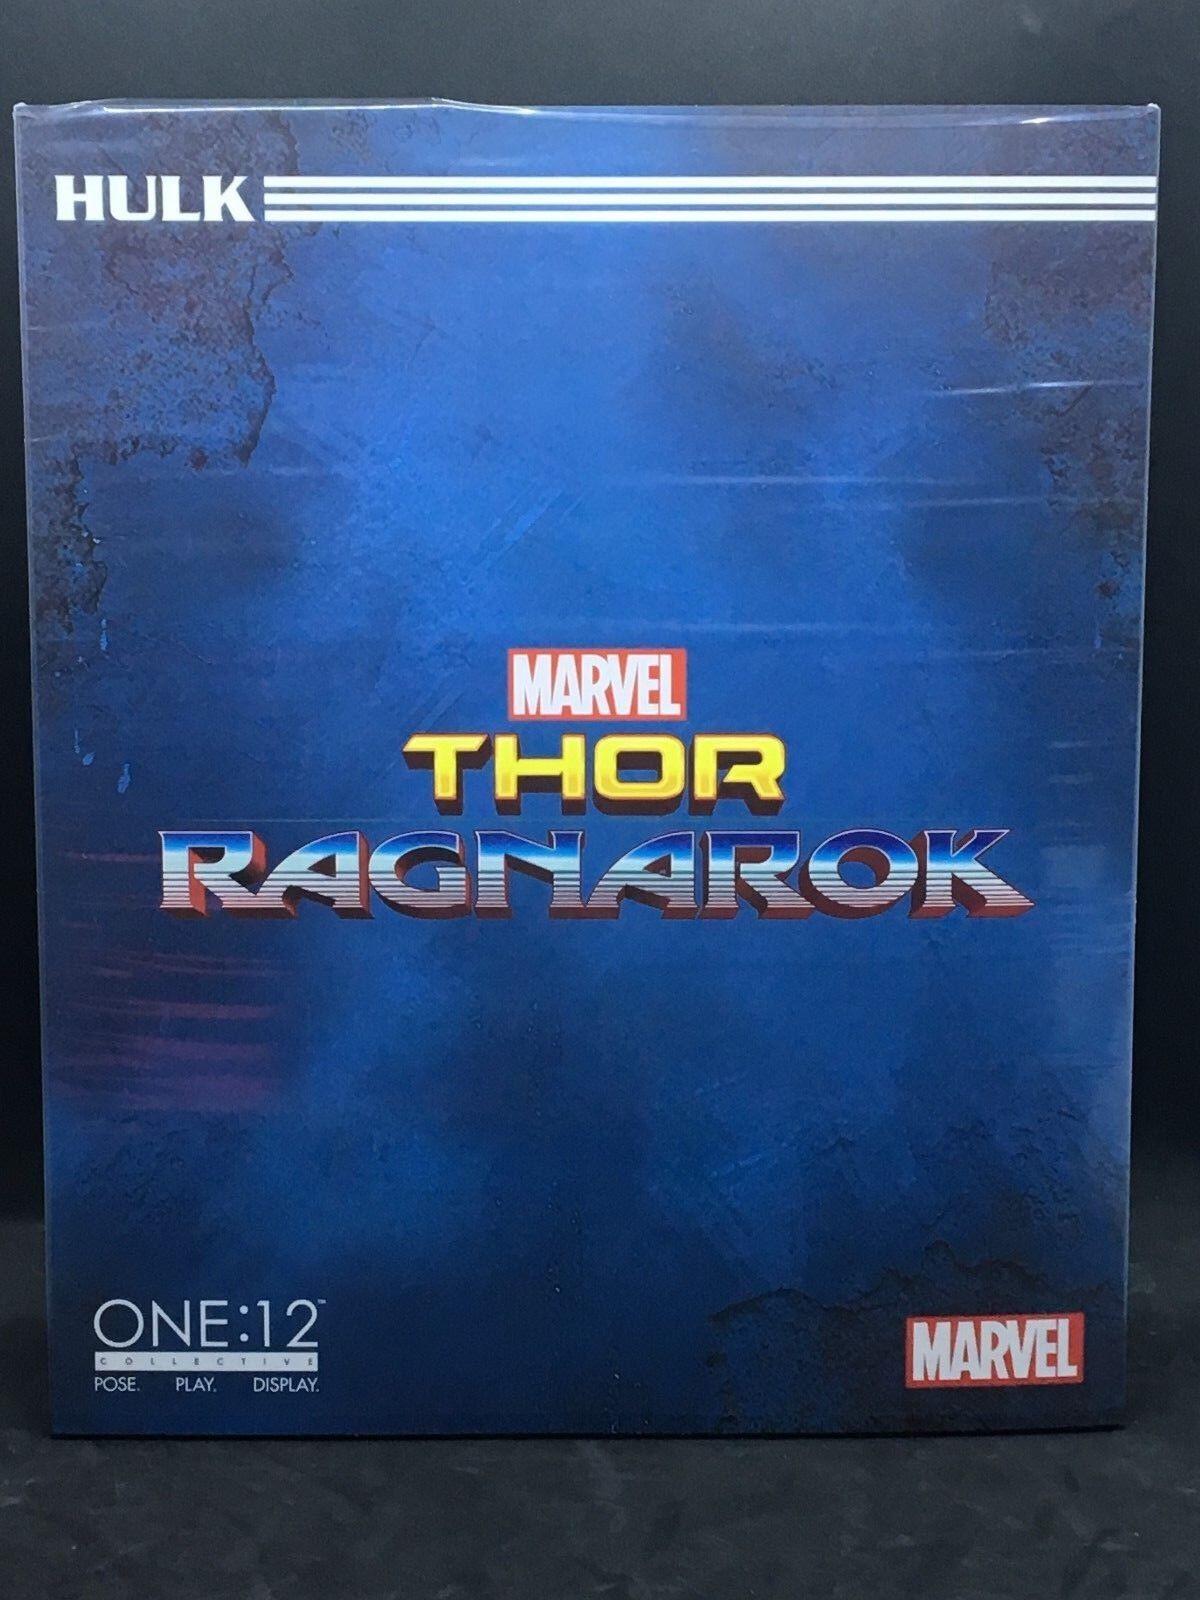 MEZCO ONE 12 COLLECTIVE Thor Ragnarok Hulk